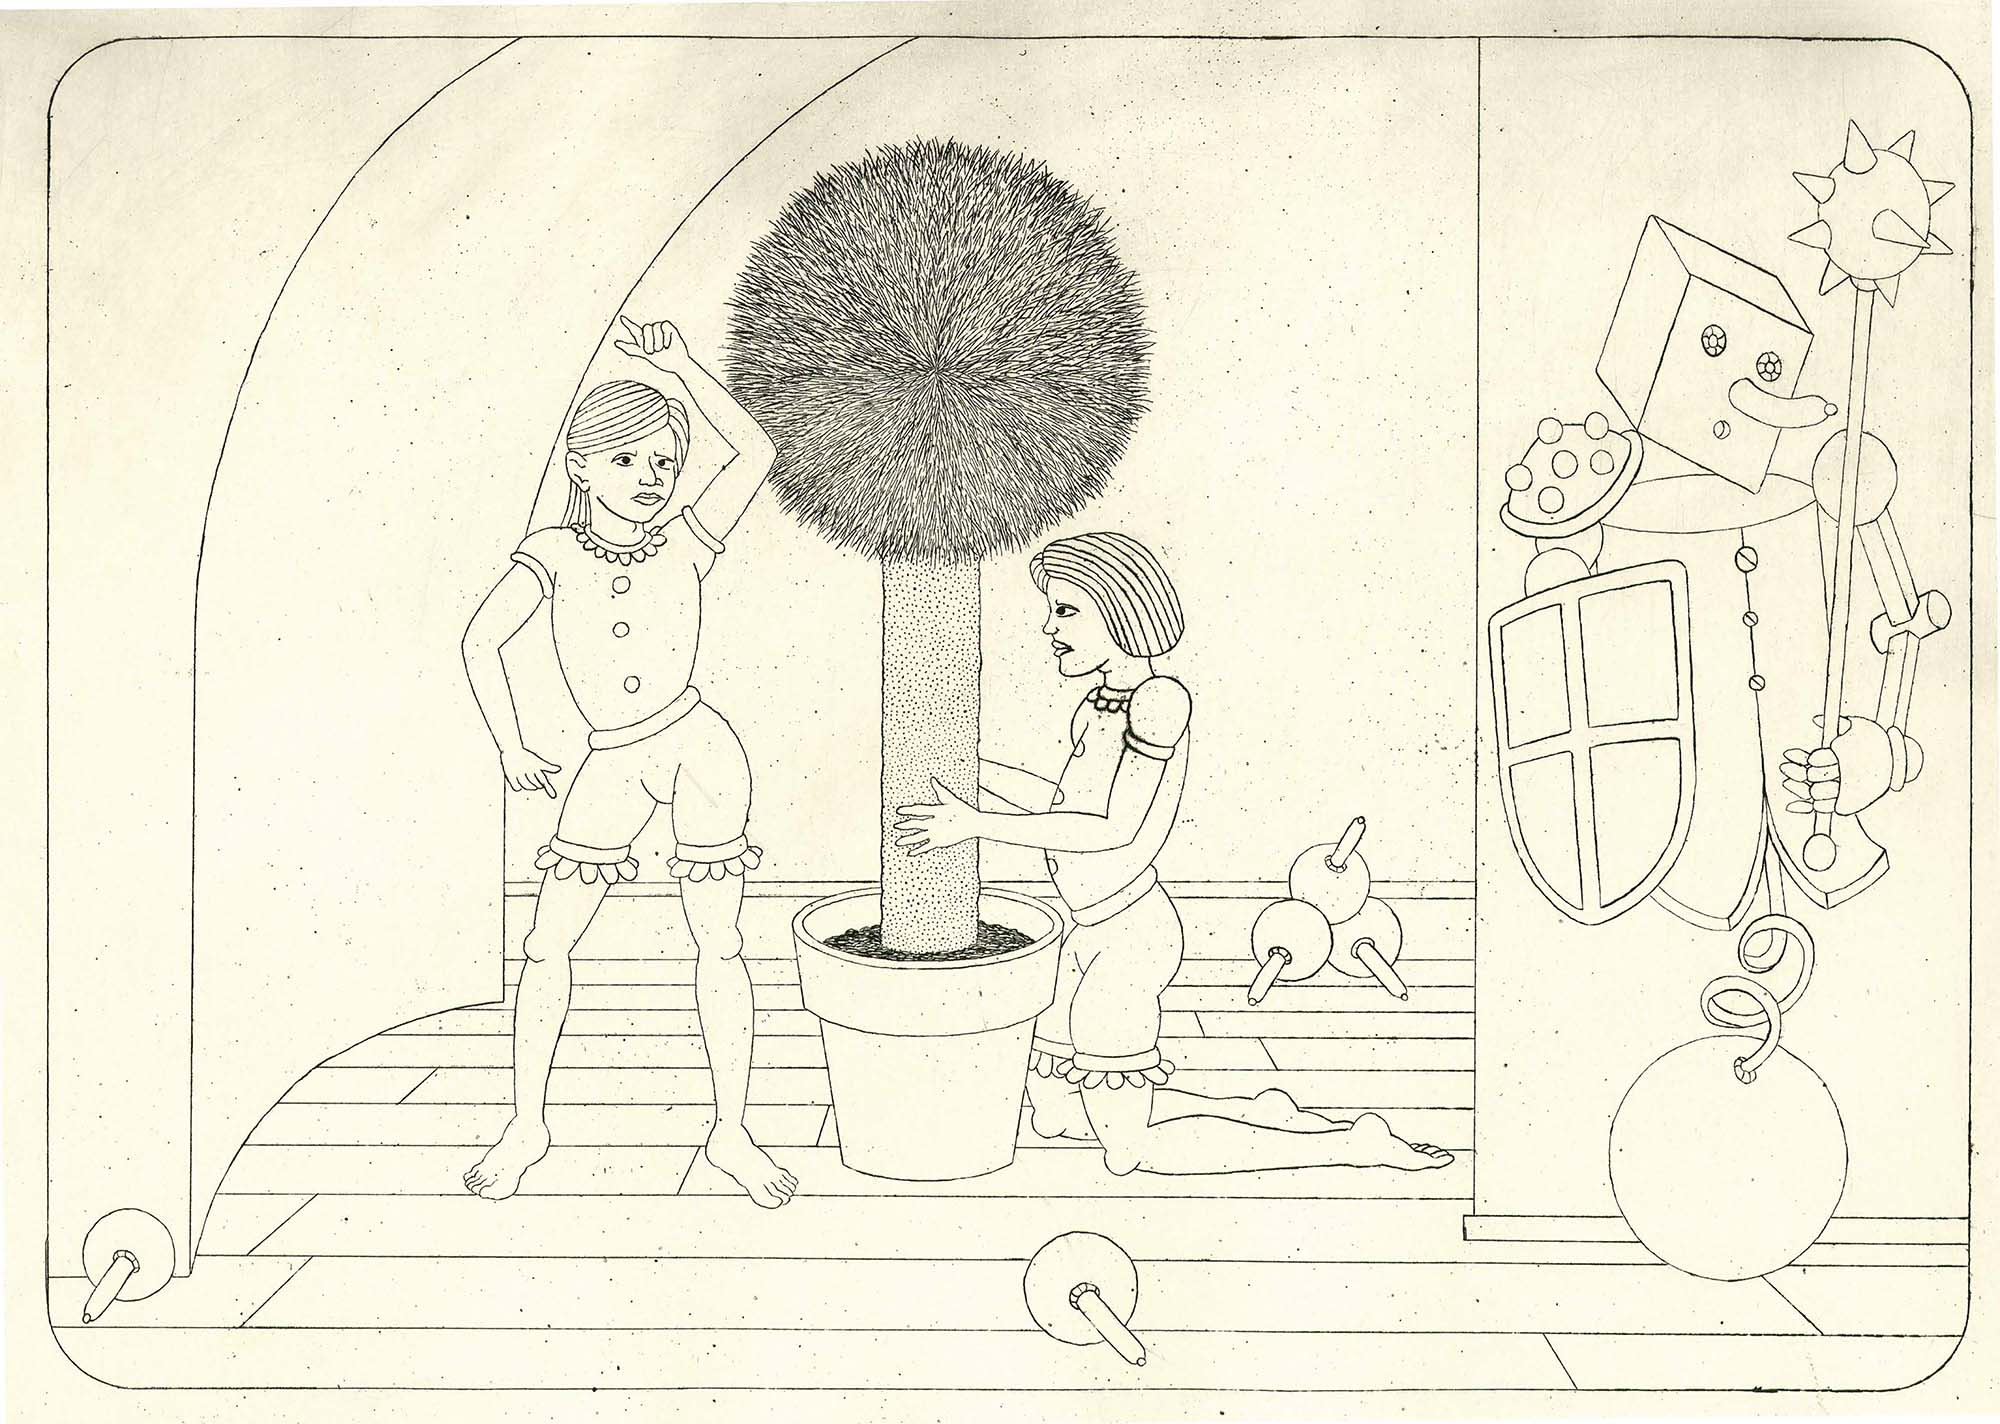 Daniel-Stafford-BA-Fine-Art-Drawing.jpg